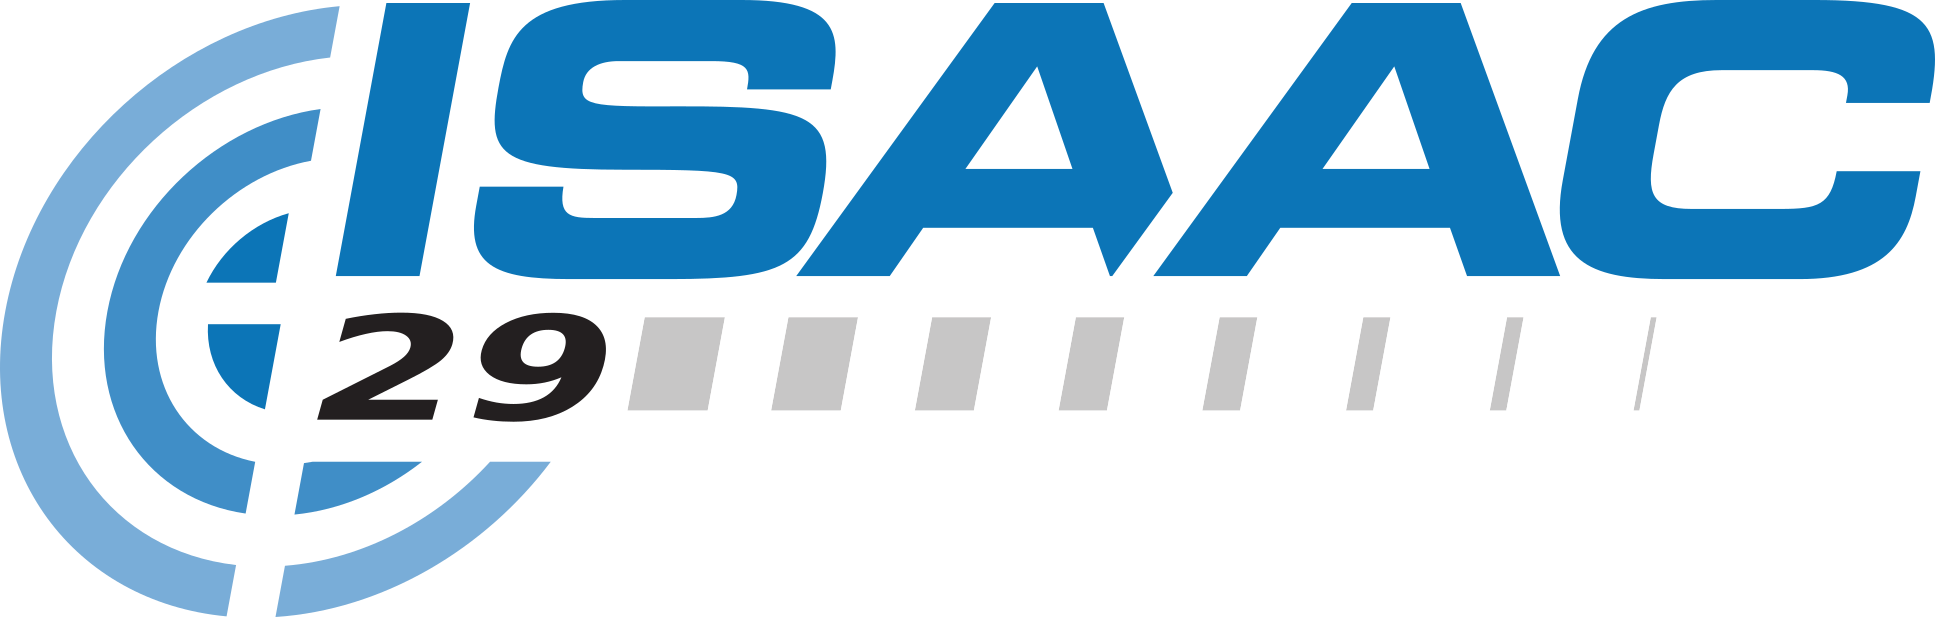 ISAAC29_300ppi